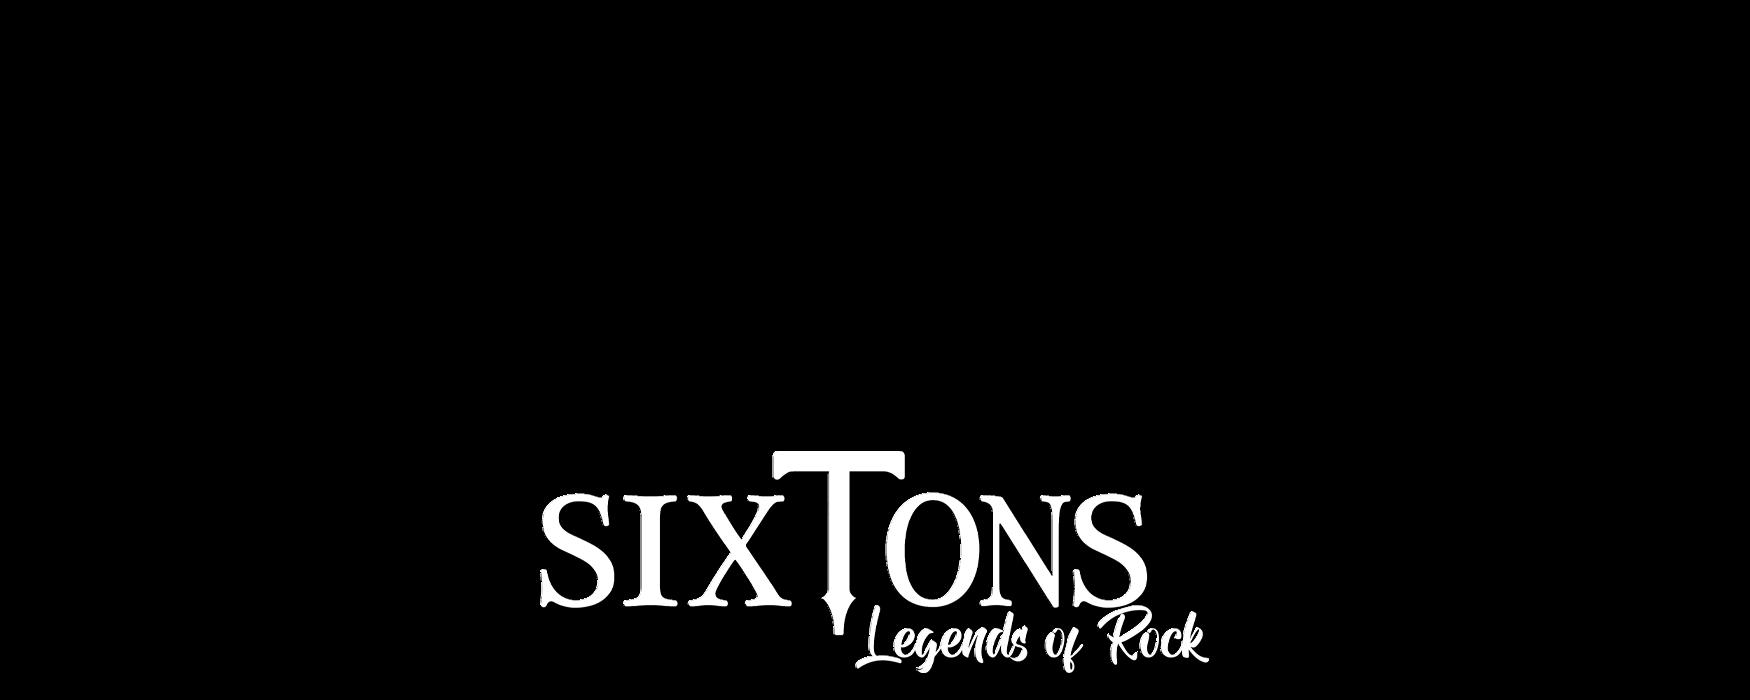 SixTons